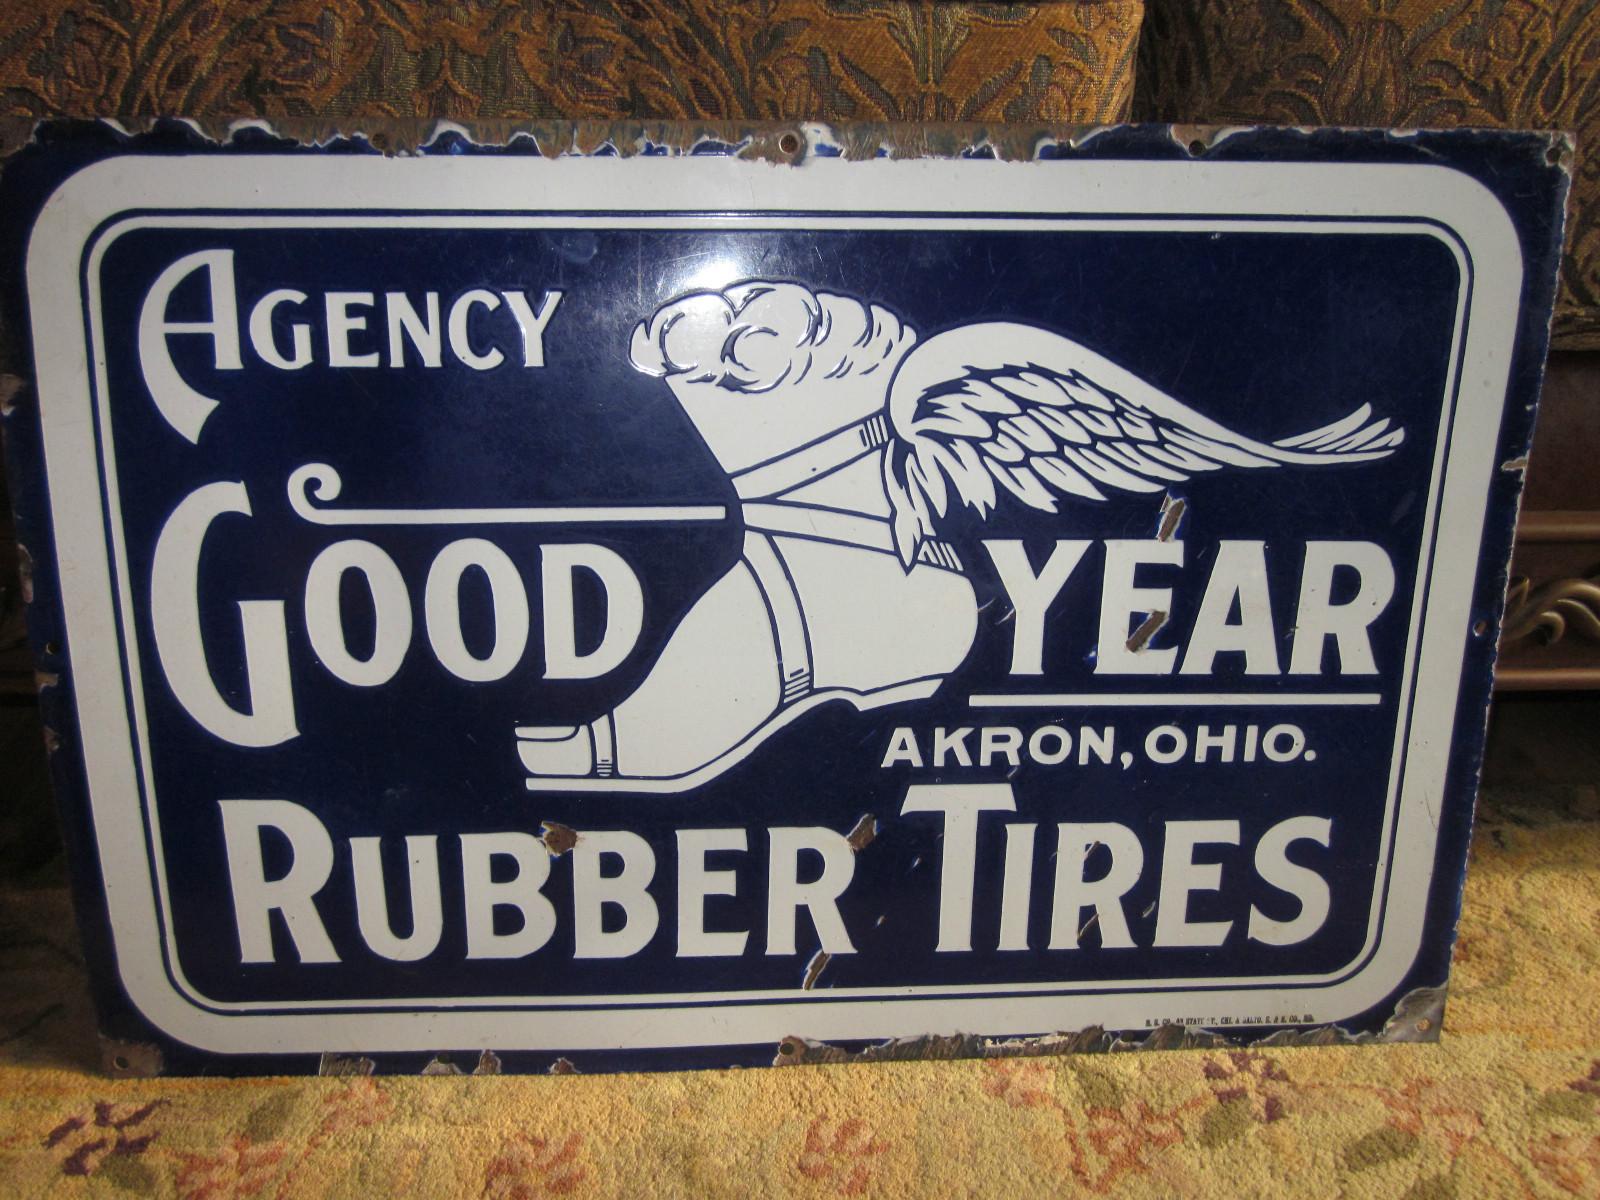 Very Rare Original Goodyear Rubber Tires Porcelain Sign. Dog Shaming Signs. Coronary Artery Disease Signs. Metro Mumbai Signs Of Stroke. Death Rates Signs Of Stroke. Flagman Signs. Multiply Signs. Number 33 Signs Of Stroke. Creative Building Signs